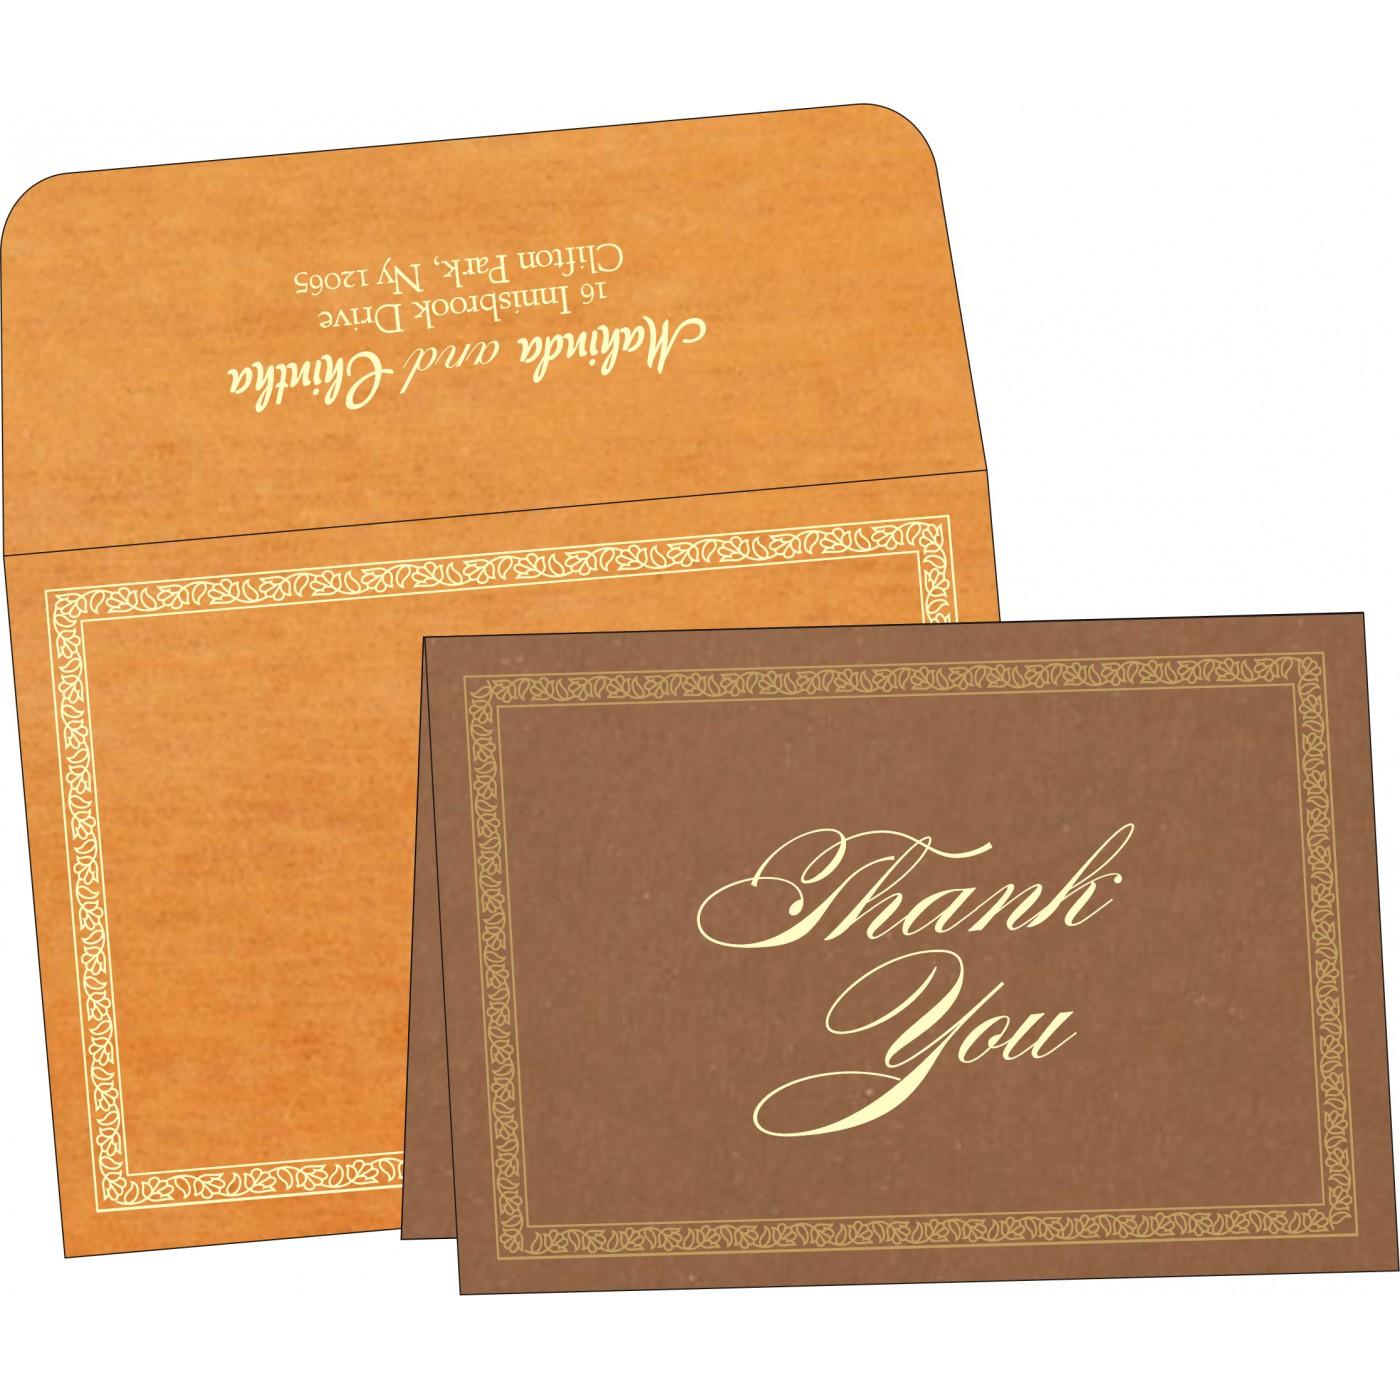 Thank You Cards : TYC-8211L - 123WeddingCards